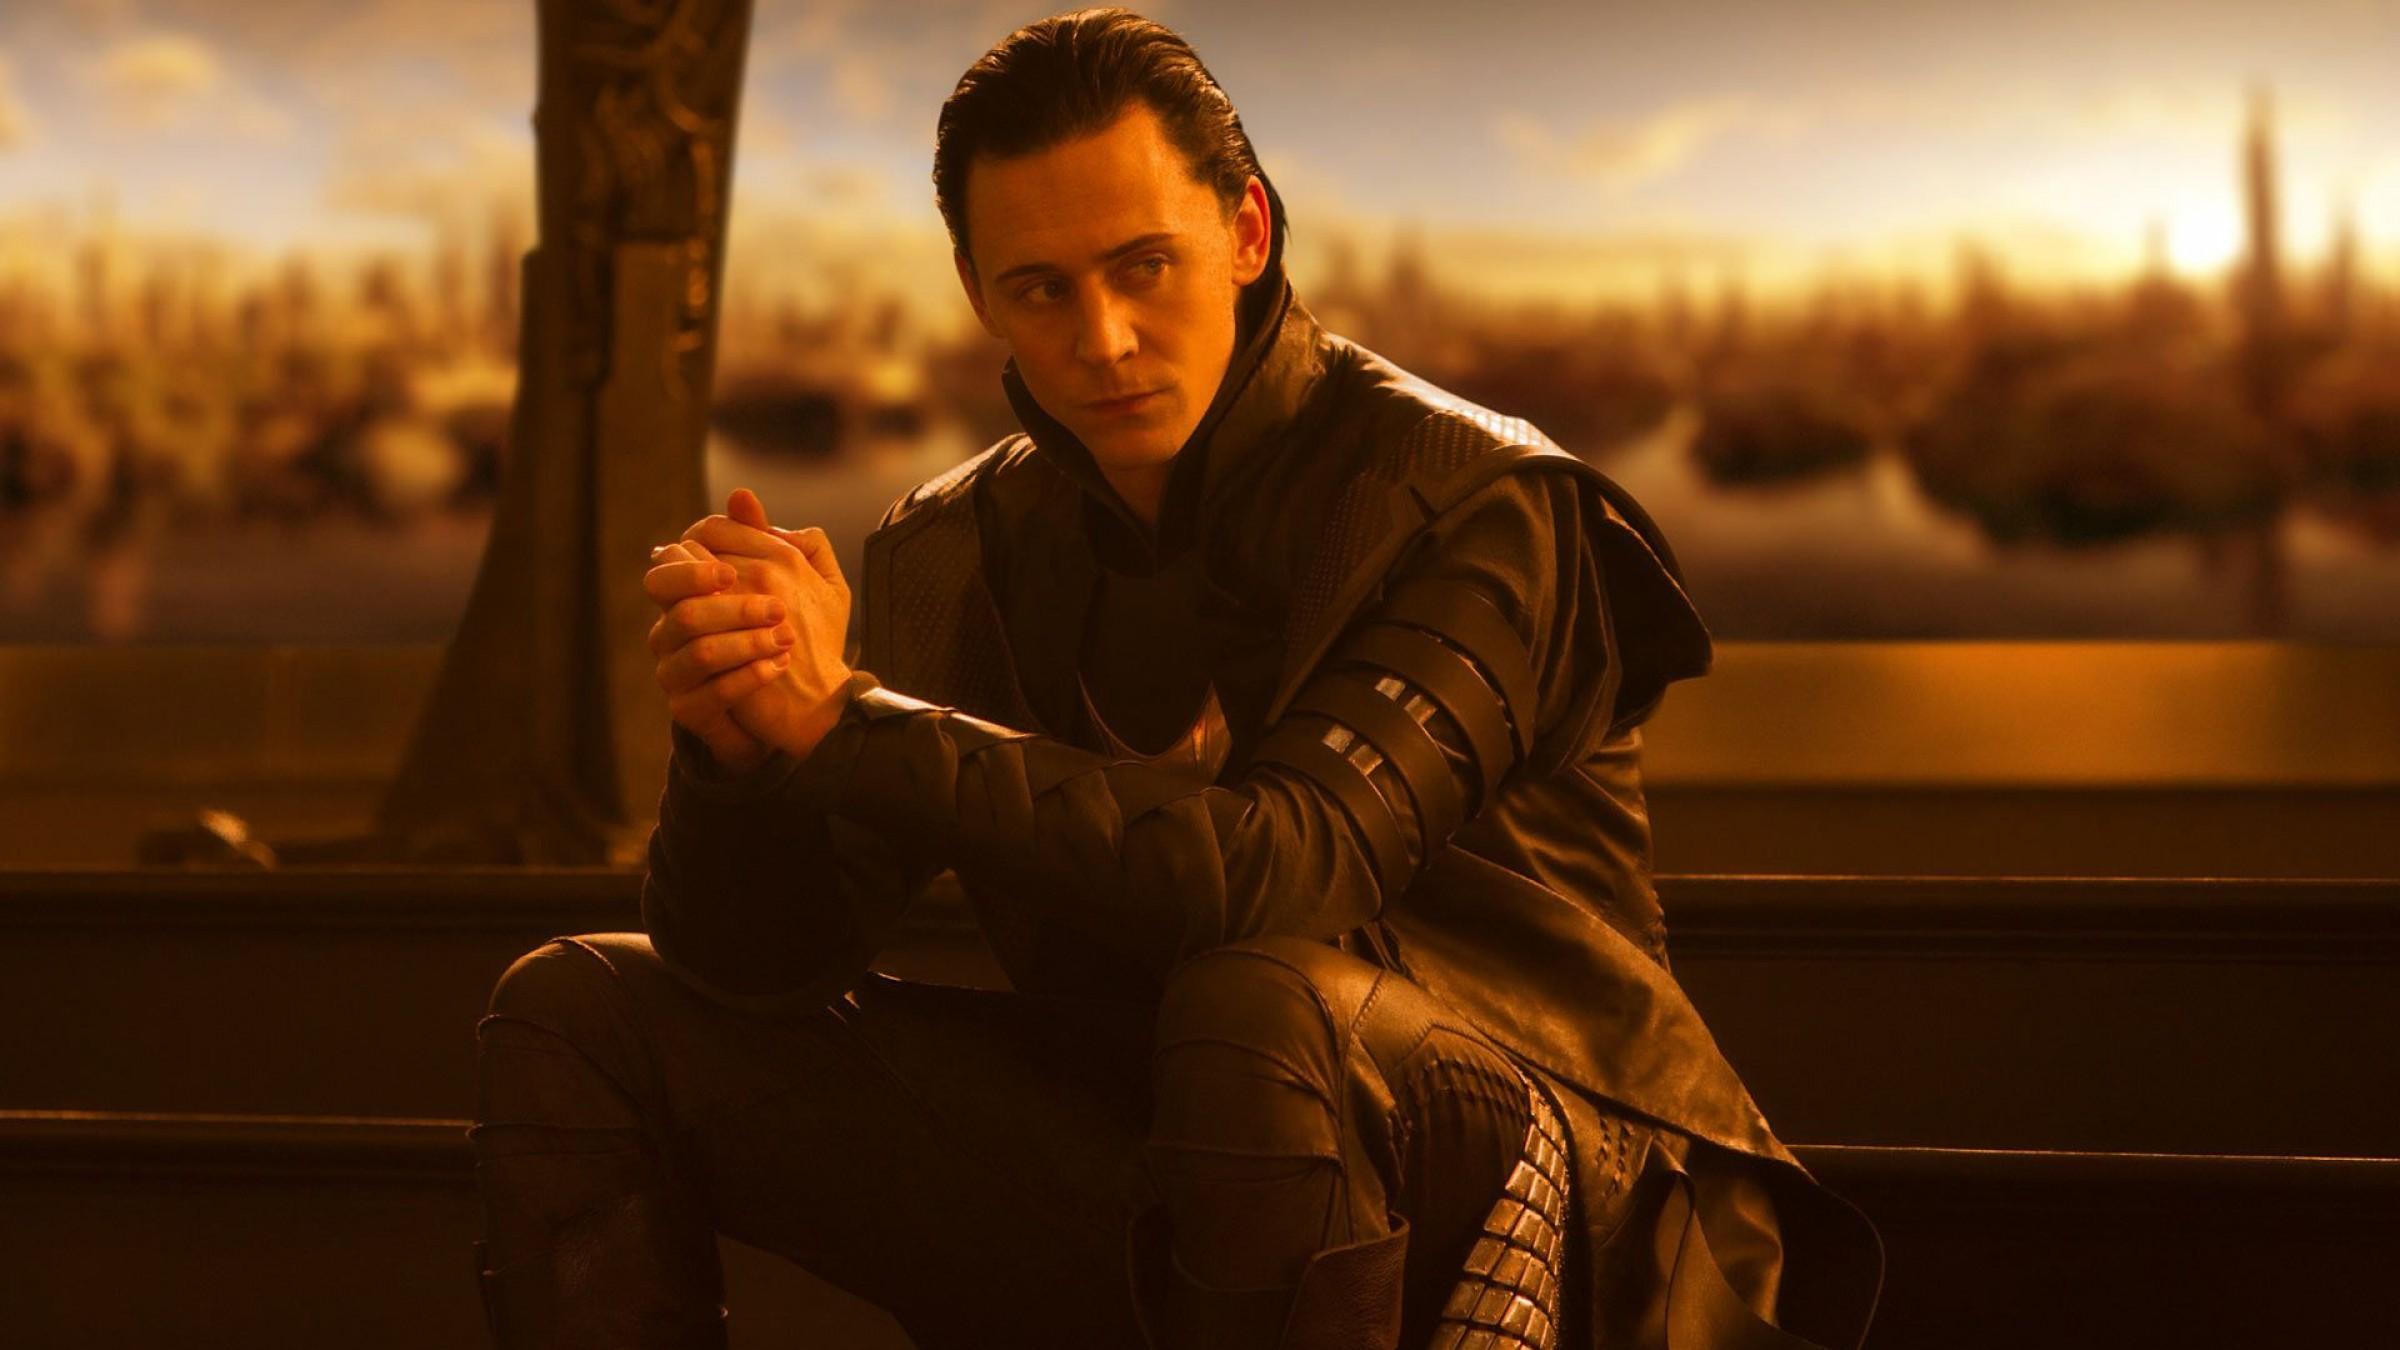 Loki-In-Asgard-From-The-Movie-Thor-1350x2400